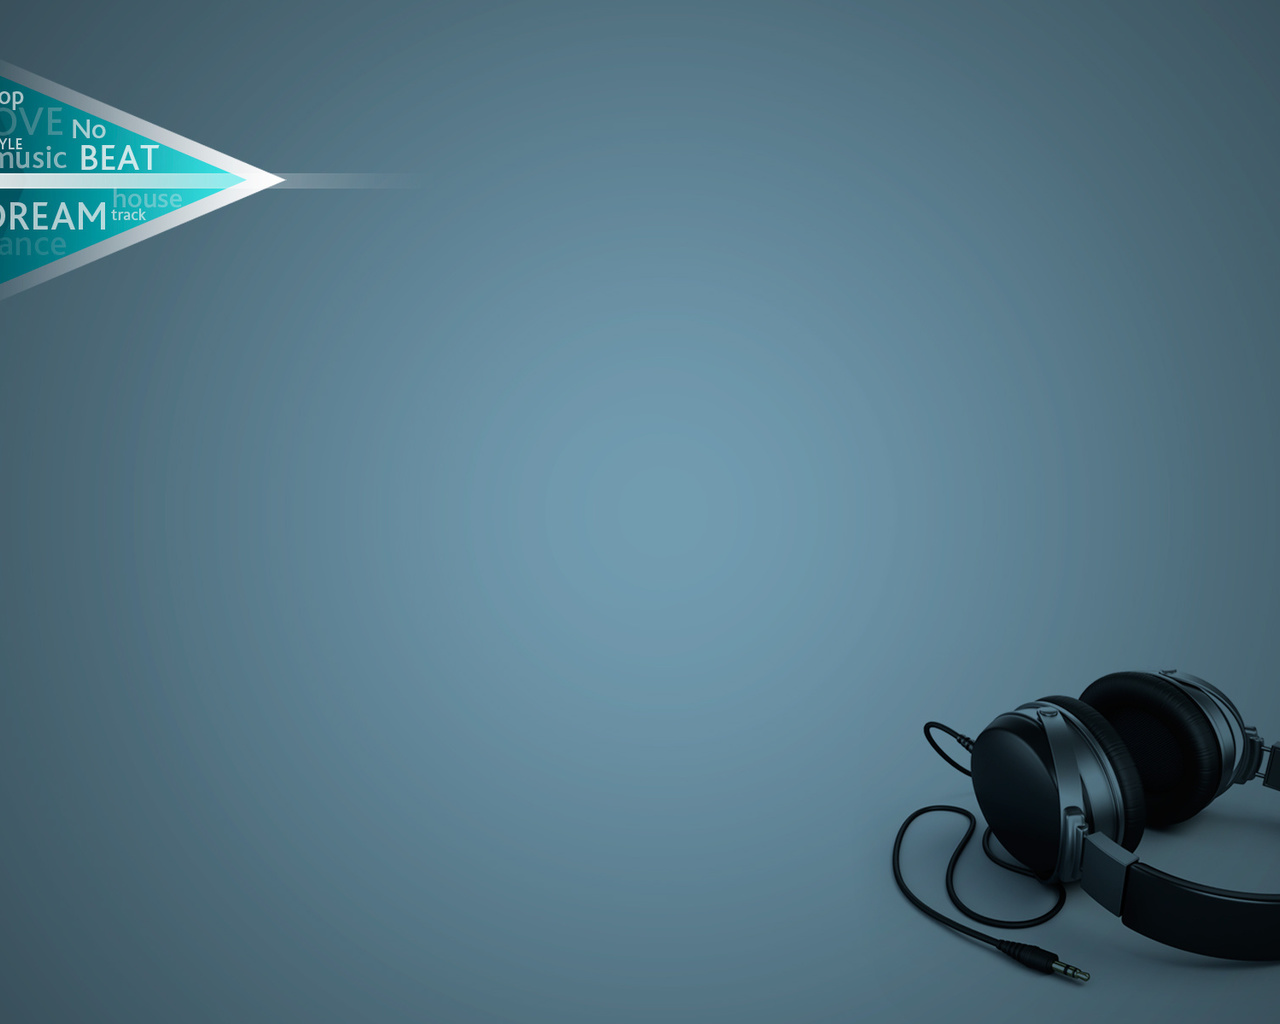 звук, музыка, наушники, синий фон, минимализм